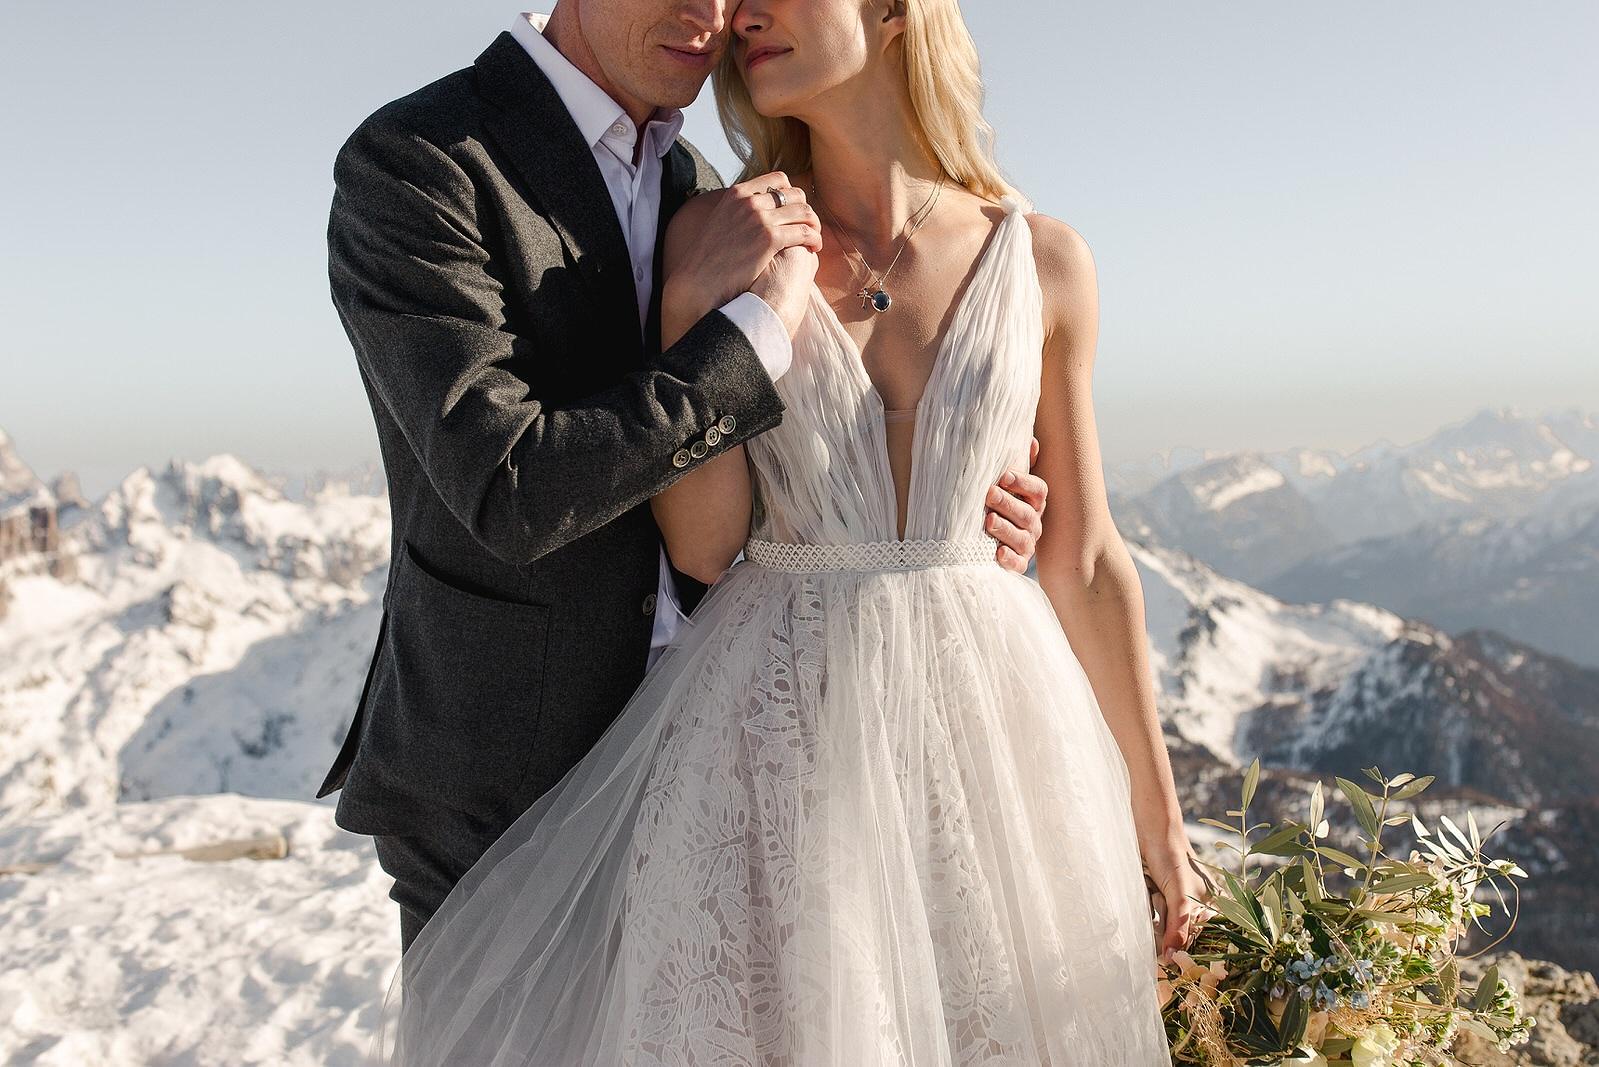 Adventurous+Dolomites+Elopement+Wedding+Fotomagoria34.jpg